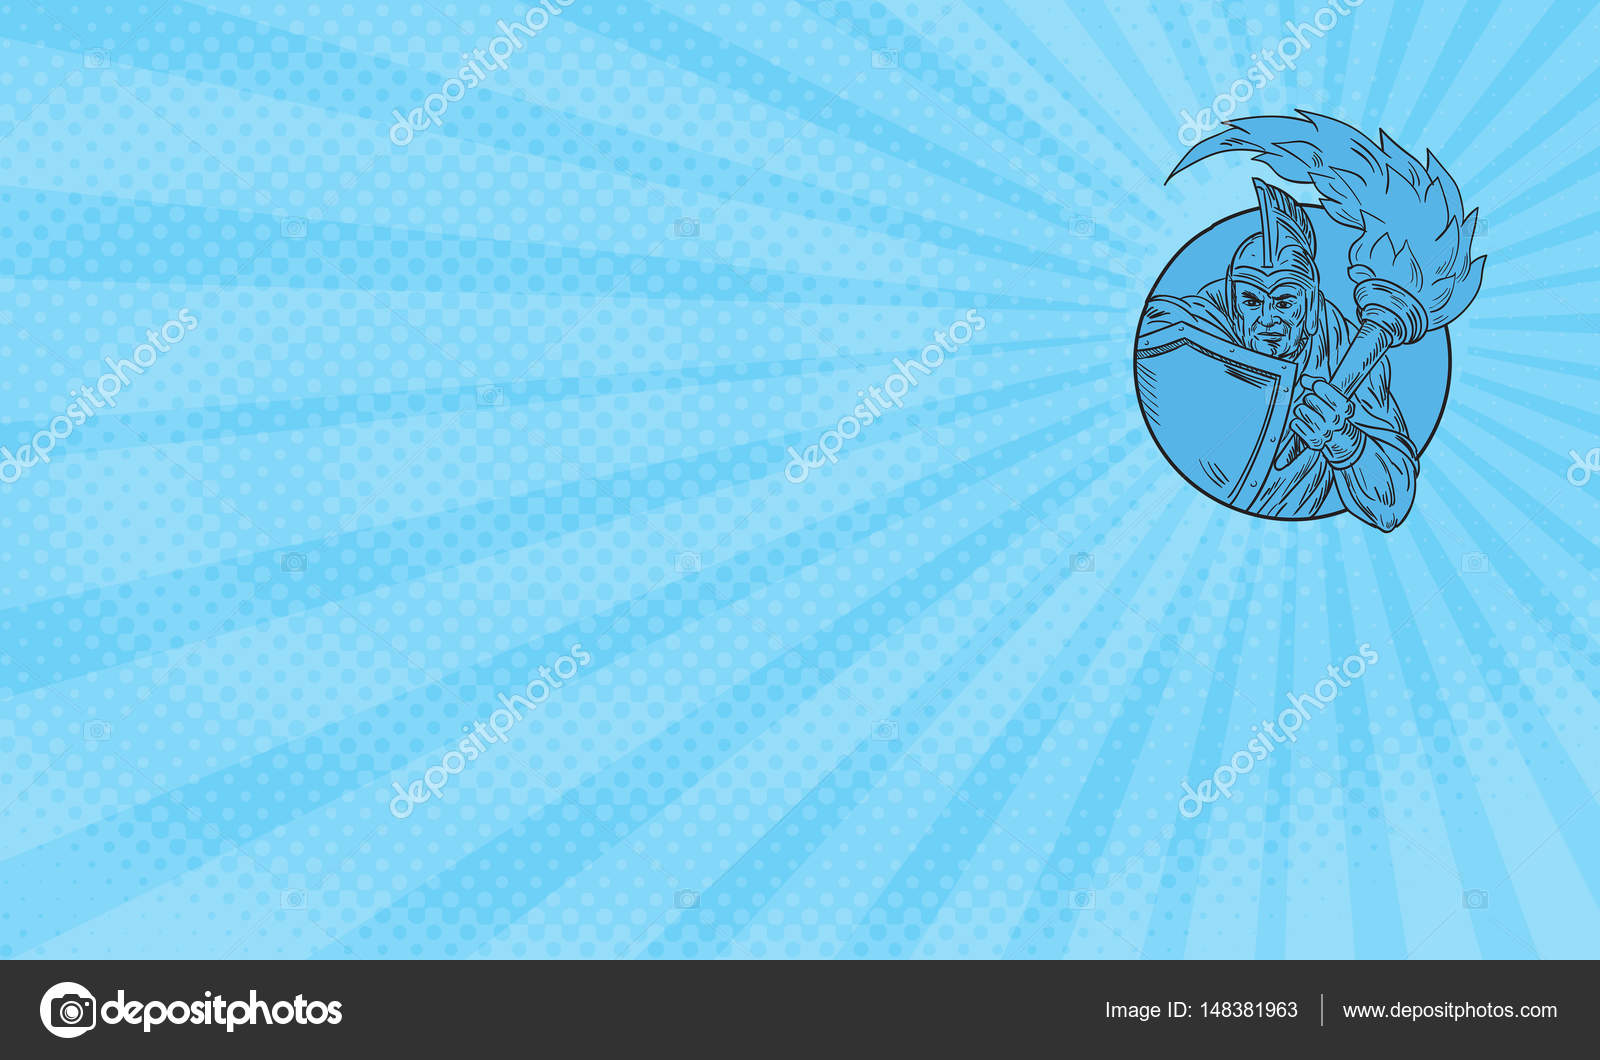 Centurion Investments Business card — Stock Photo © patrimonio ...